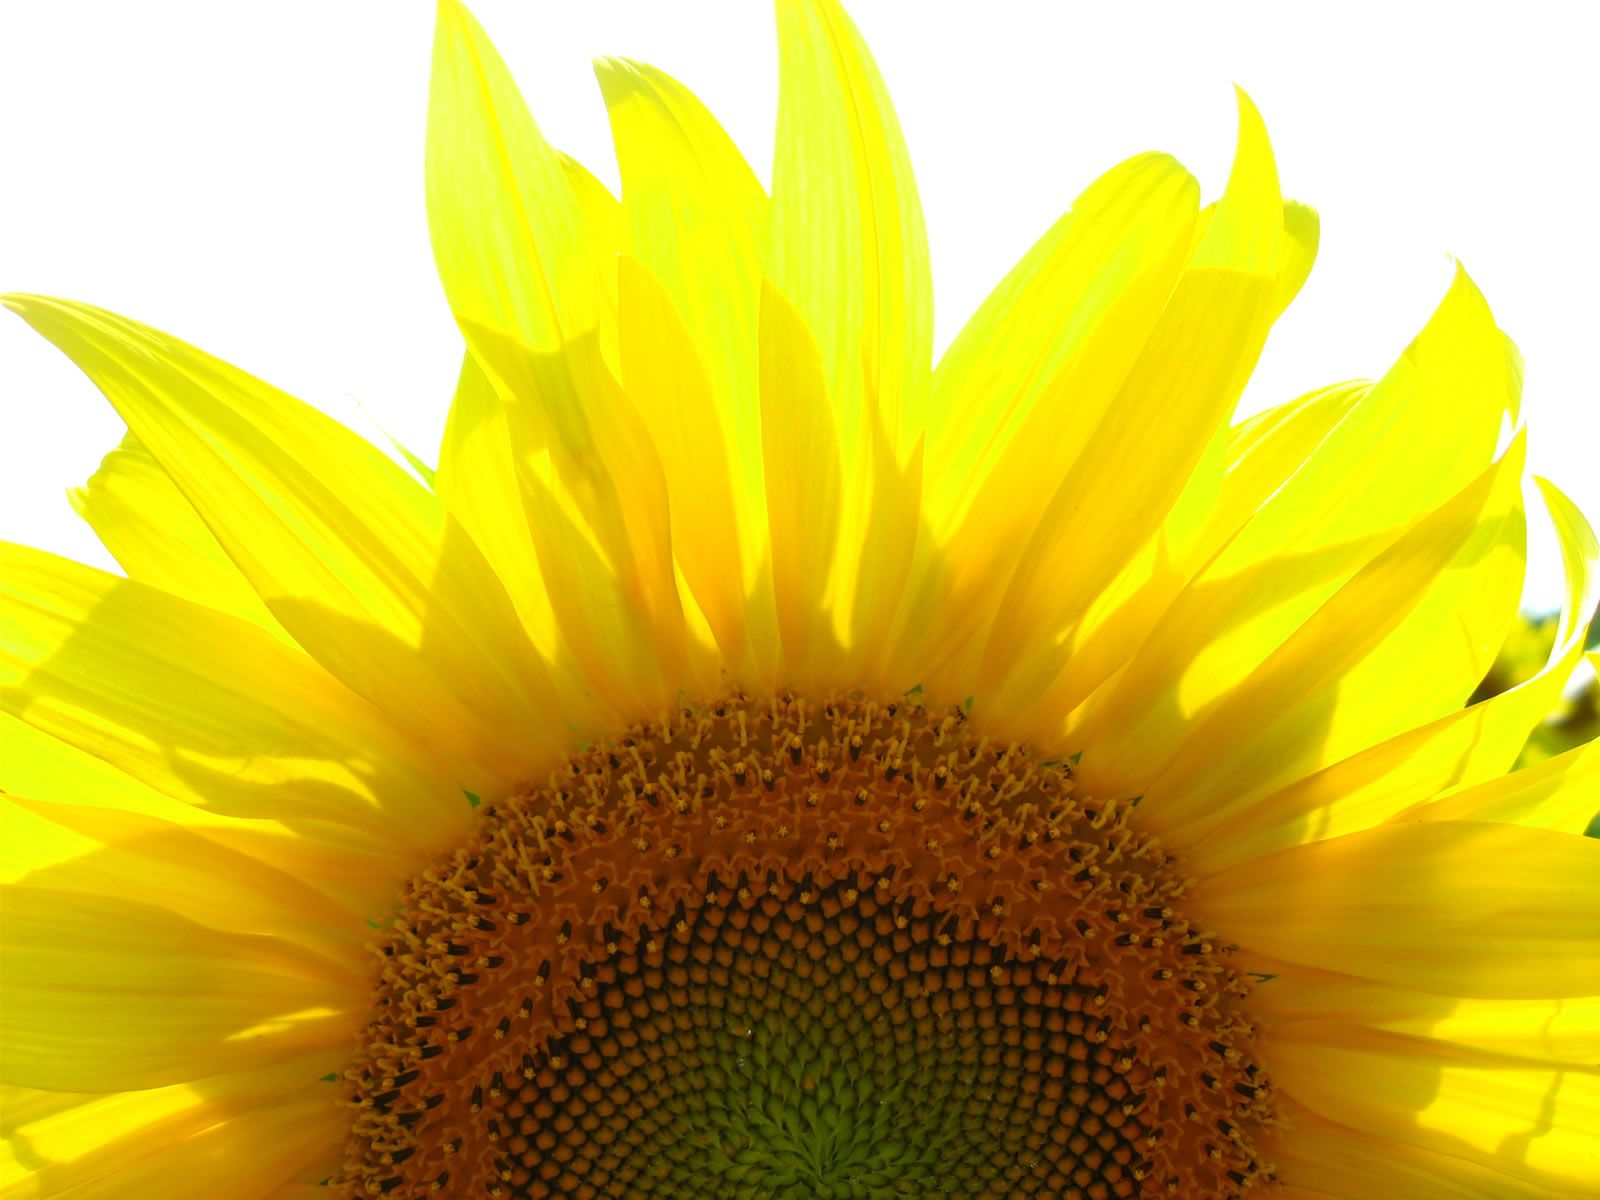 sunflower HD Photos Desktop Backgrounds Wallpapers Image ...